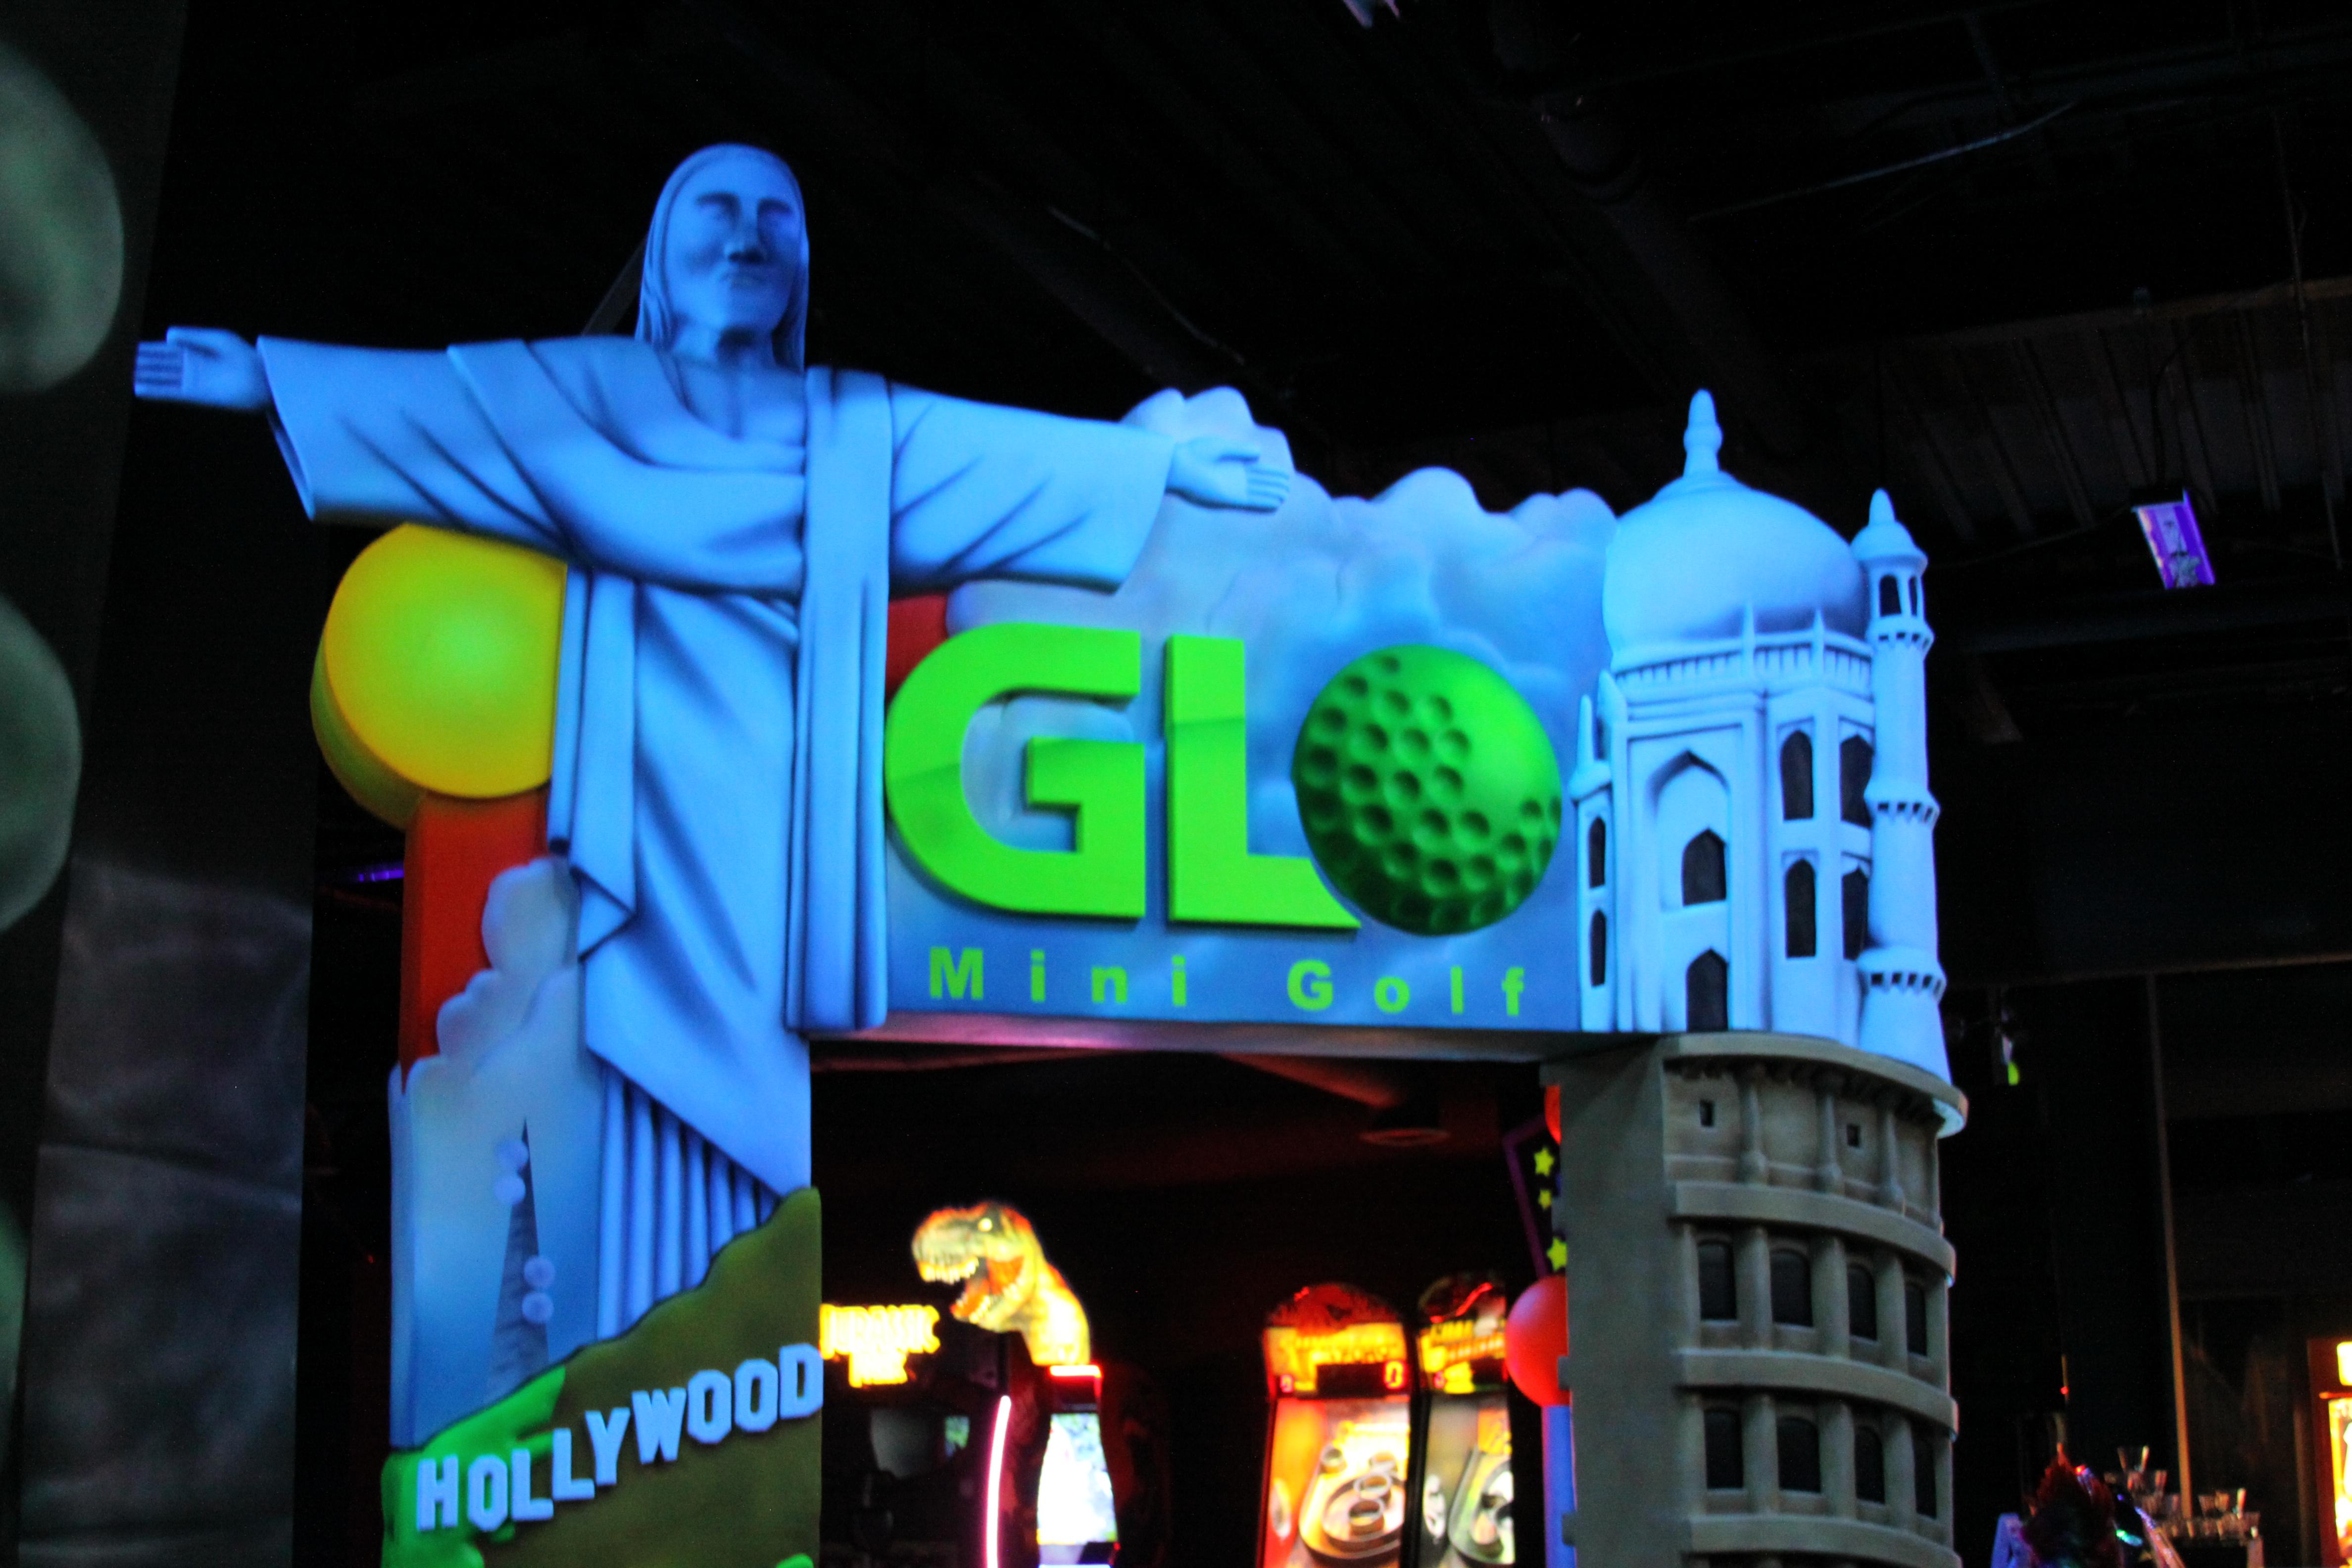 GLO Mini Golf |Arcade | Virtual Reality | Ice Cream Bar image 0